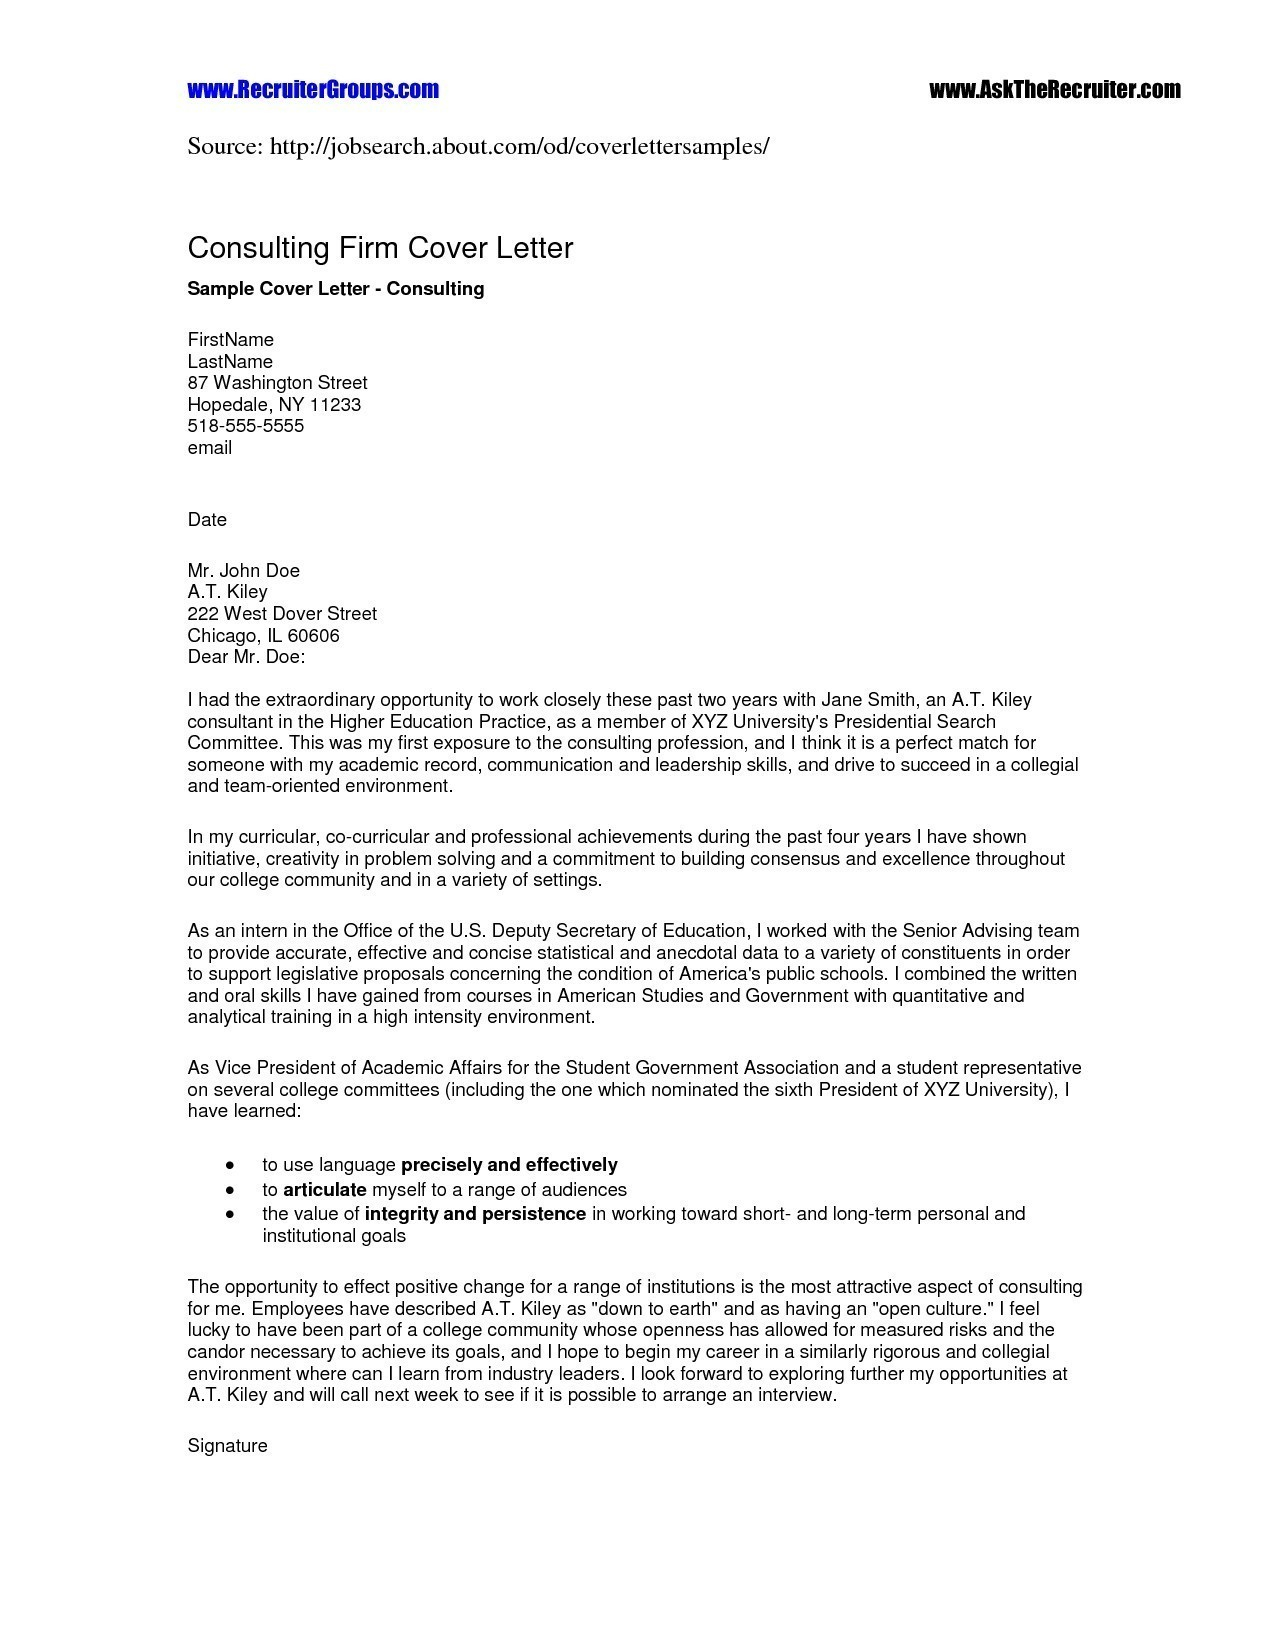 Proof Of Employment Letter Template - Sample Job Verification Letter Refrence Job Application Letter